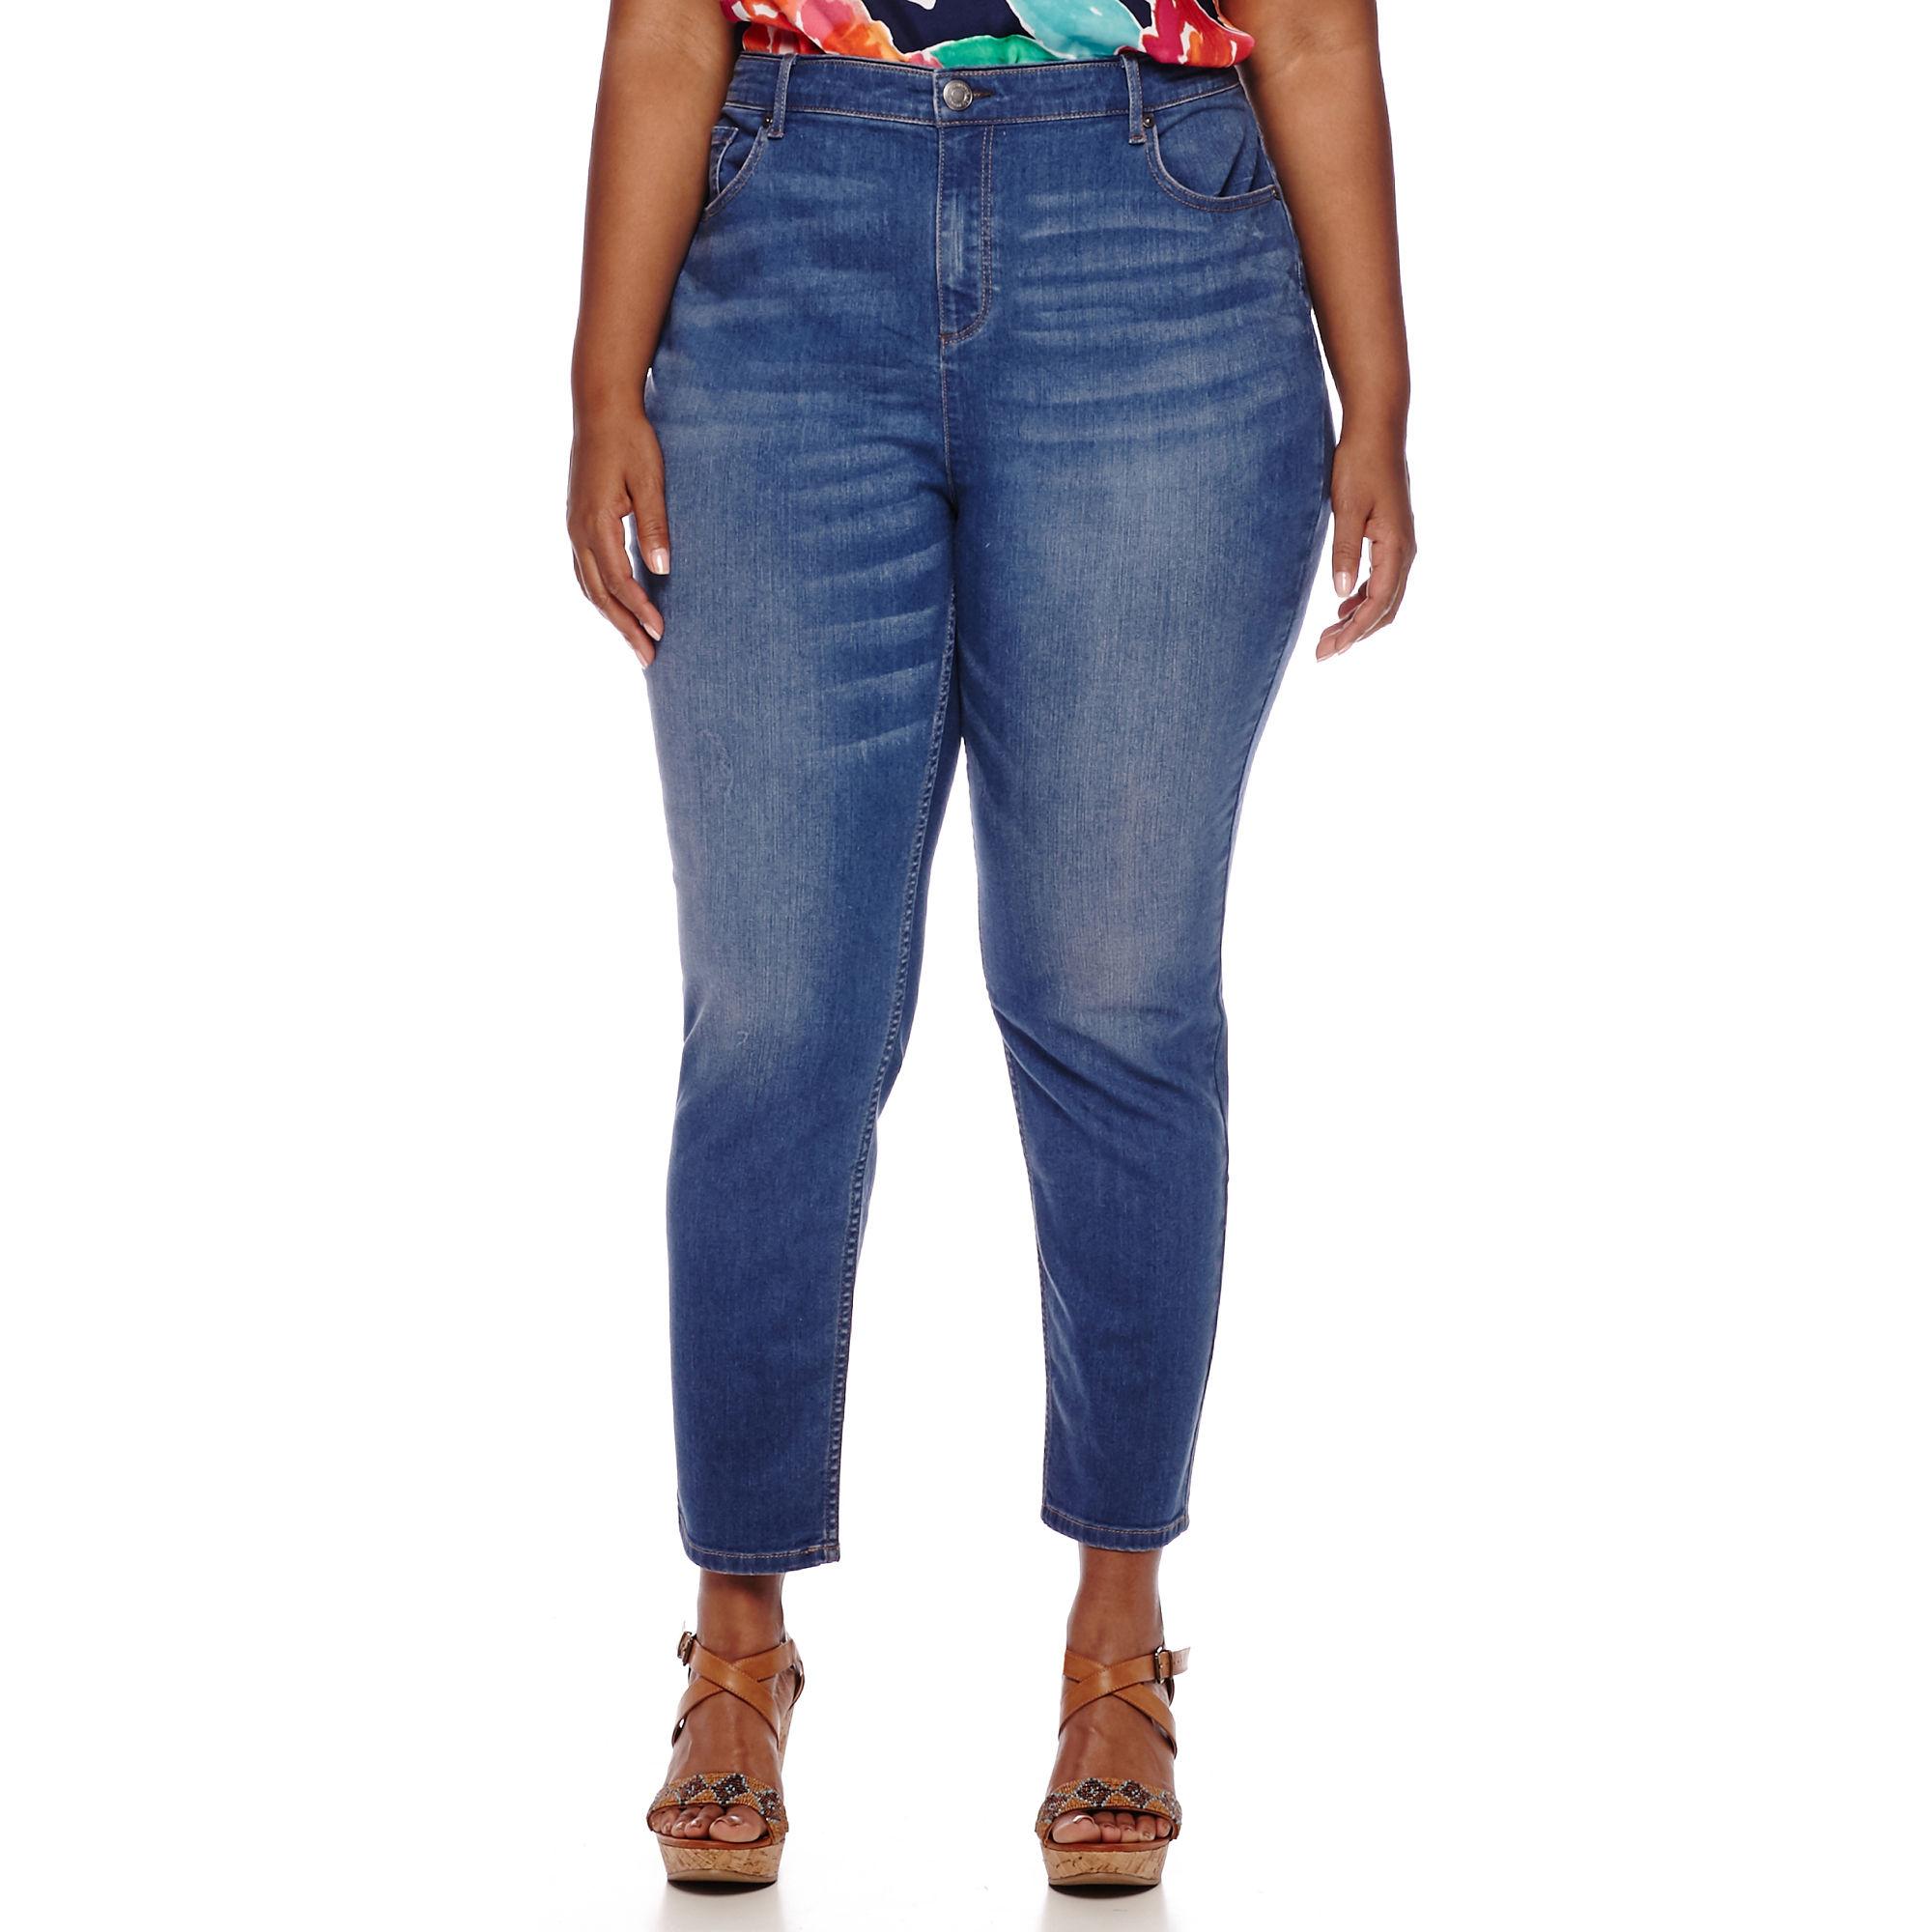 Liz Claiborne Classic-Fit Skinny Ankle Jeans - Plus